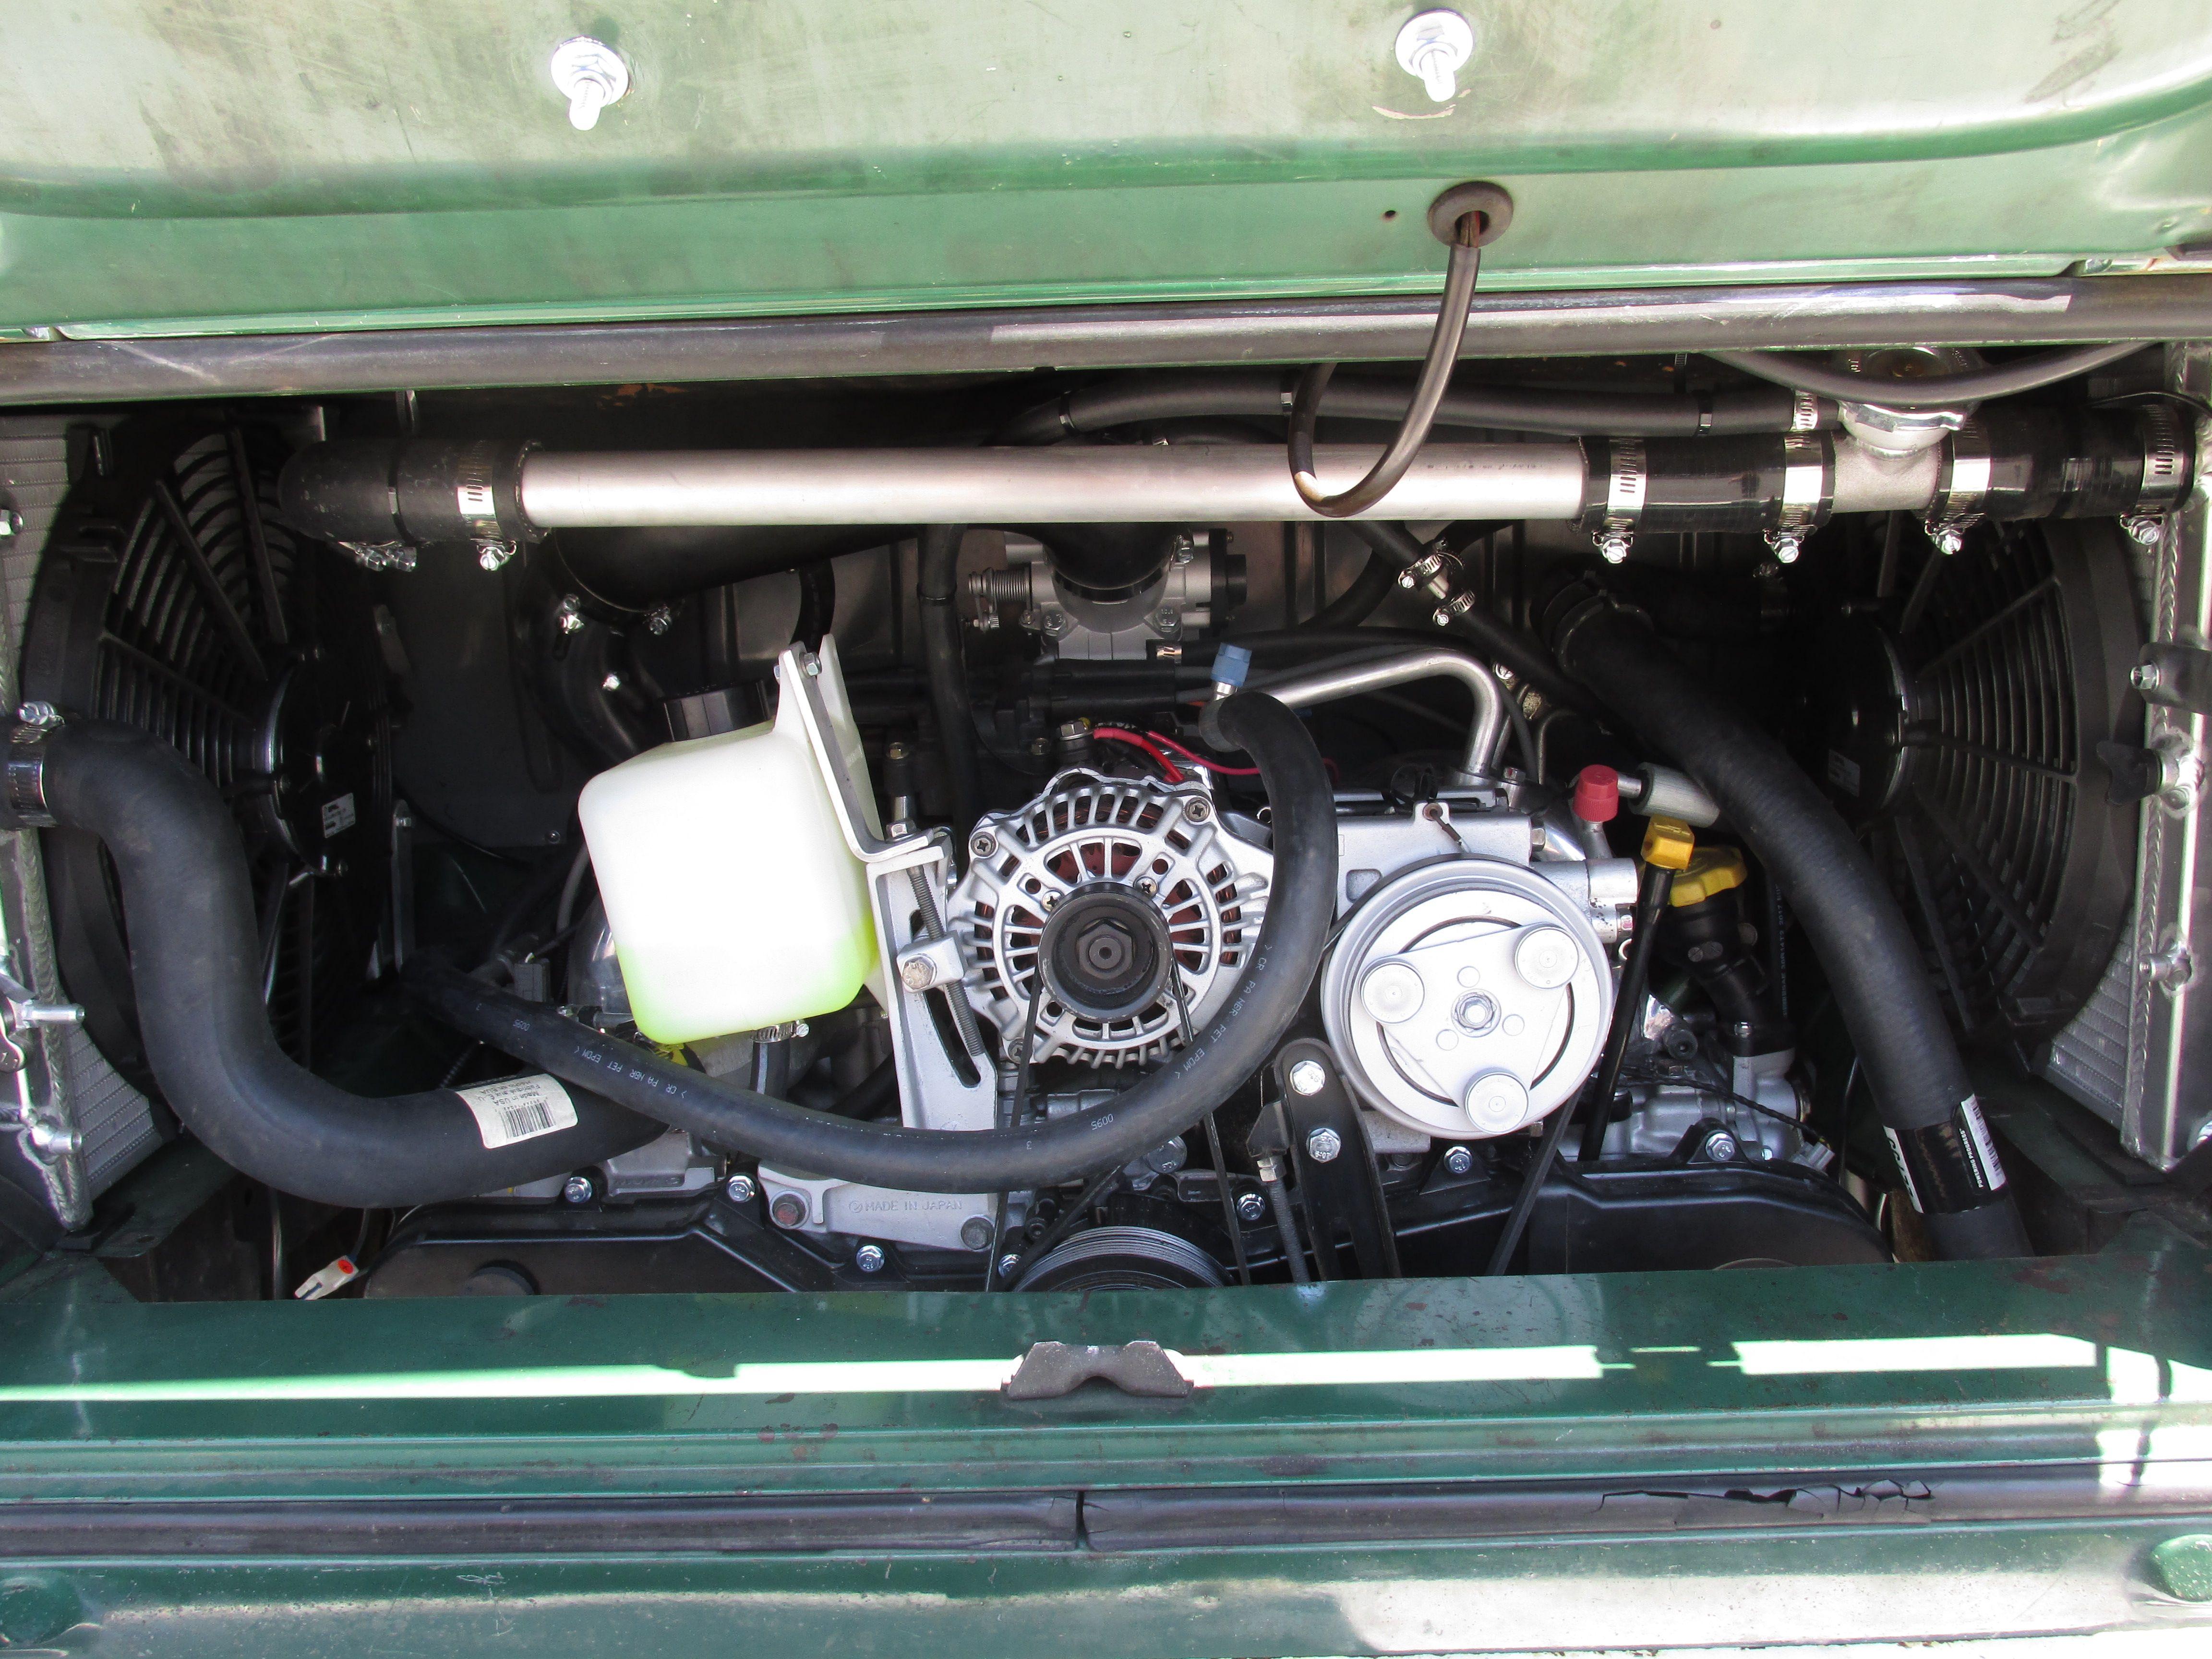 SubiSwaps Subaru engine conversion in a 1971 VW Bus  #conversion